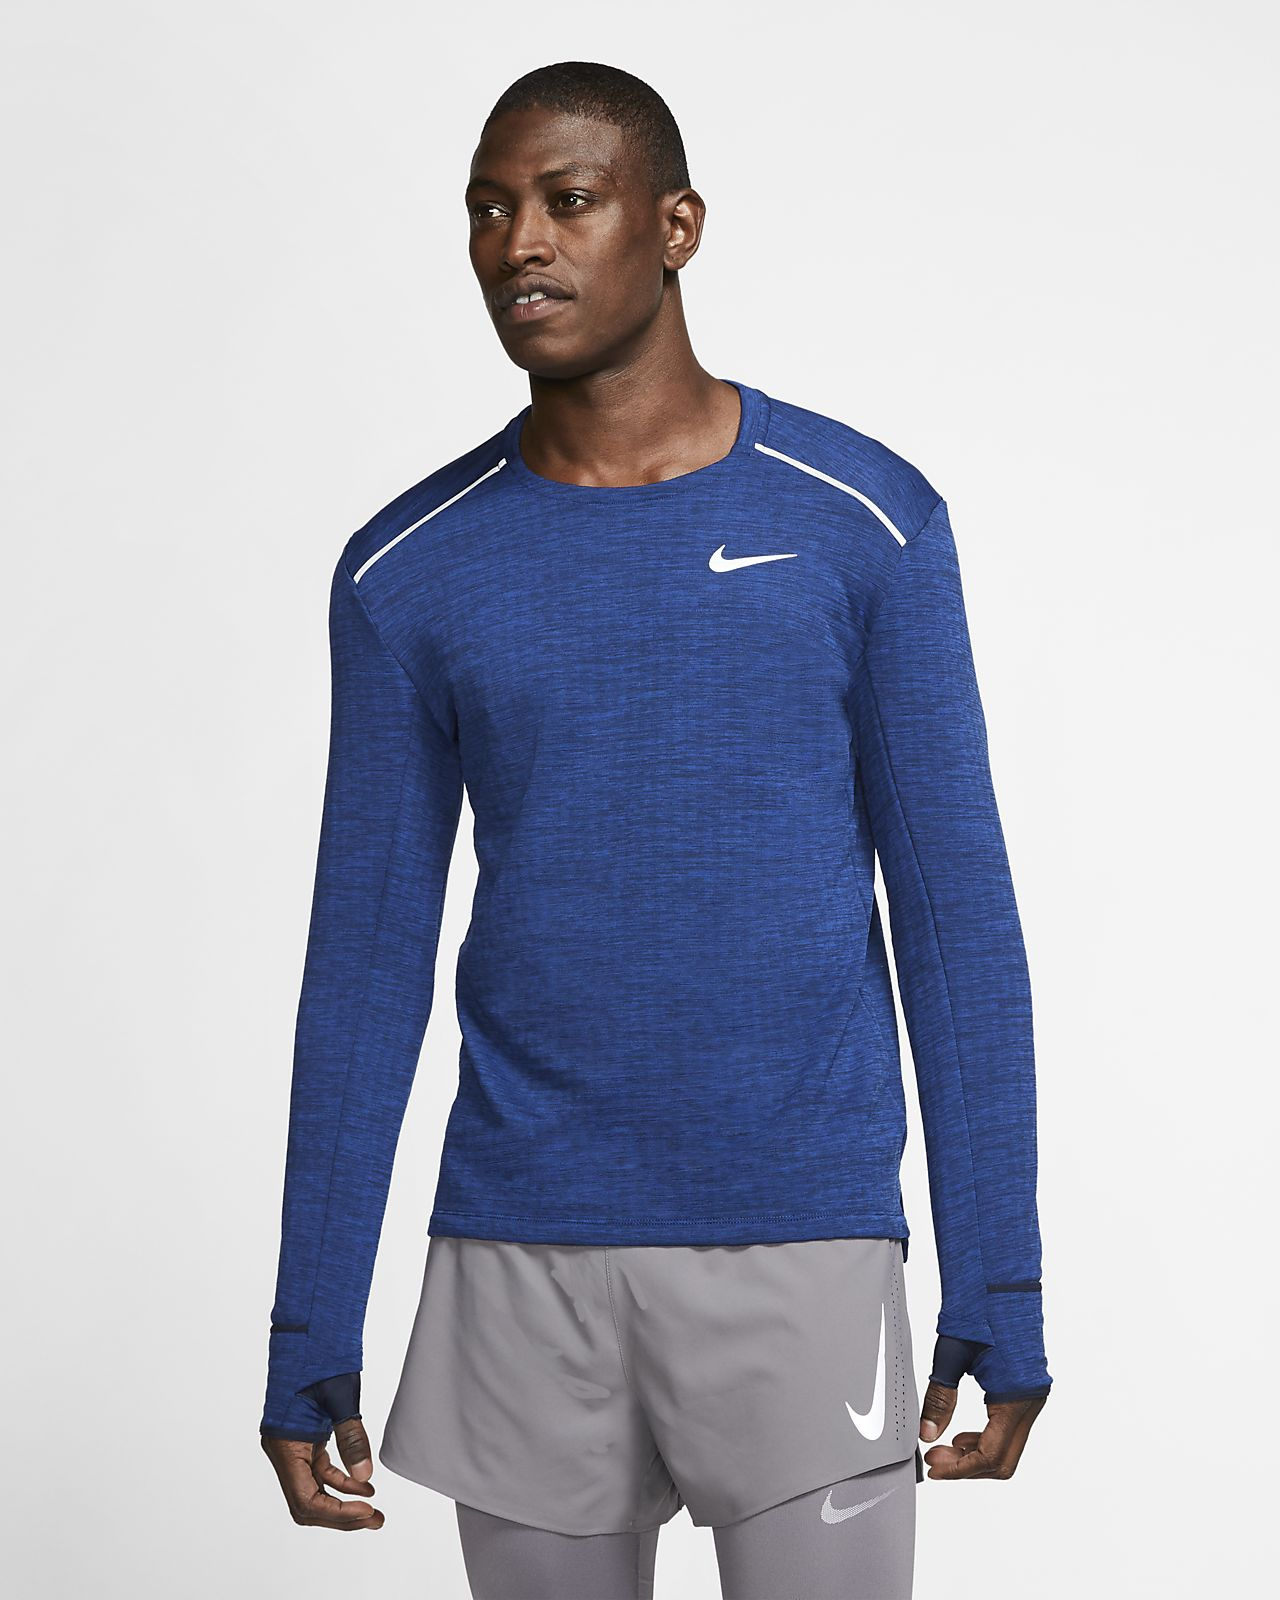 Pánské běžecké tričko Nike Therma Sphere 3.0 s dlouhým rukávem